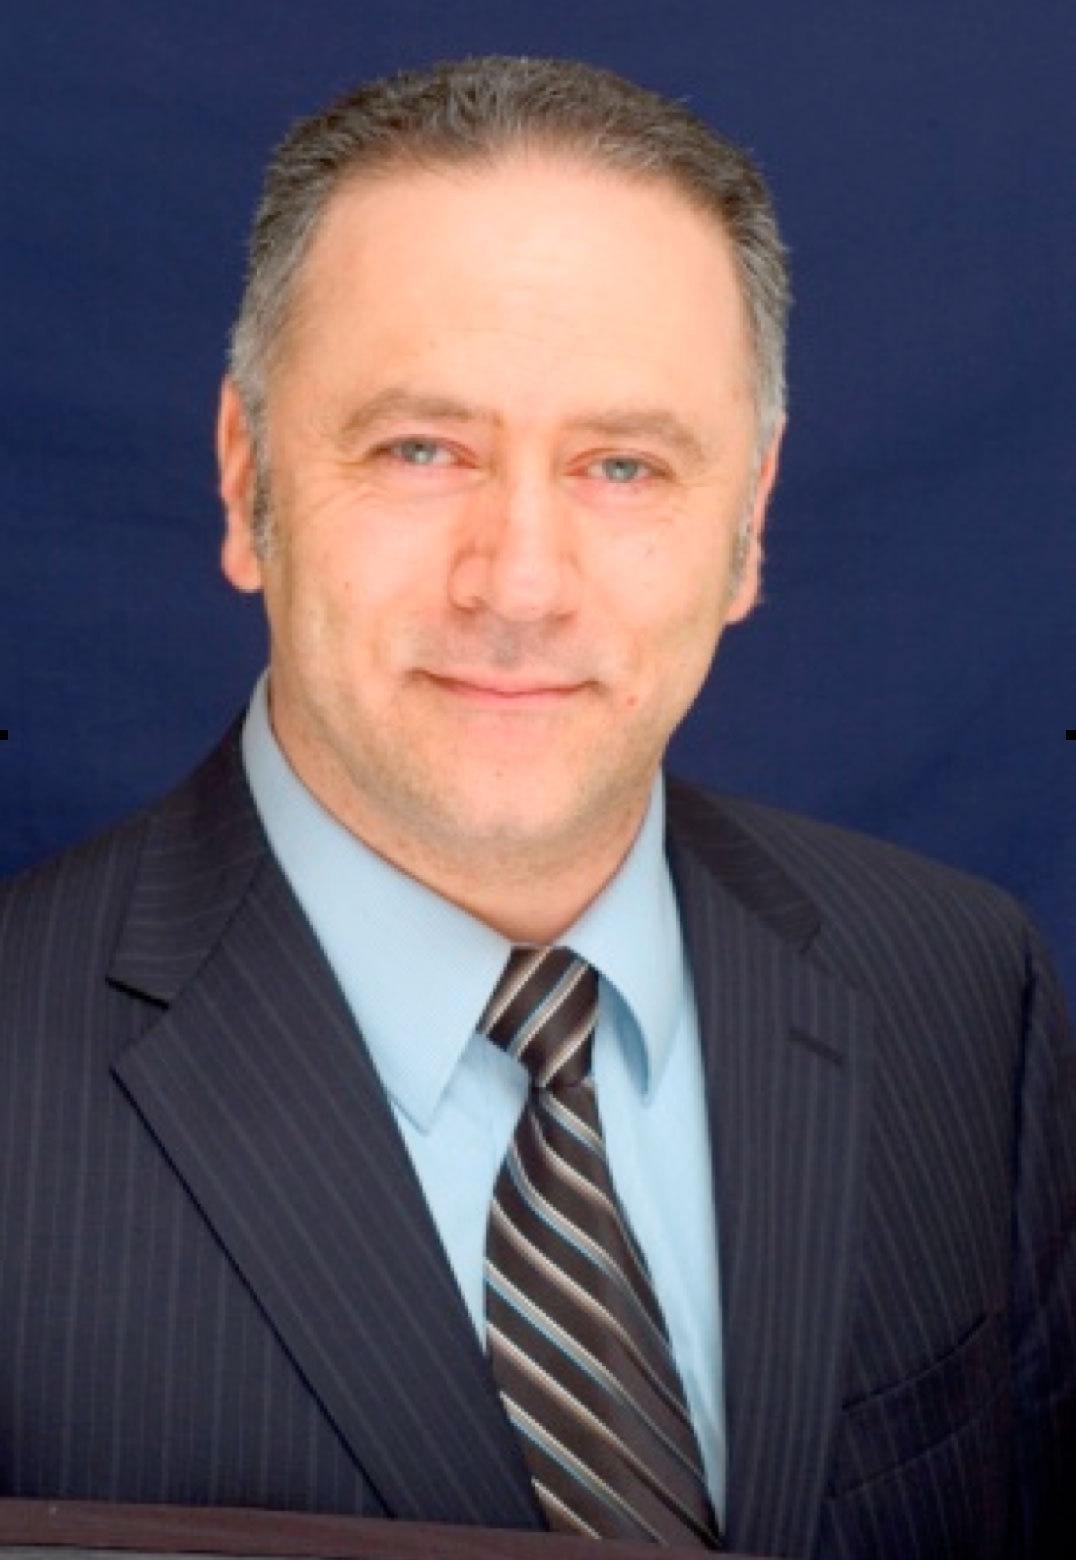 Dr._SImman-headshot.jpg